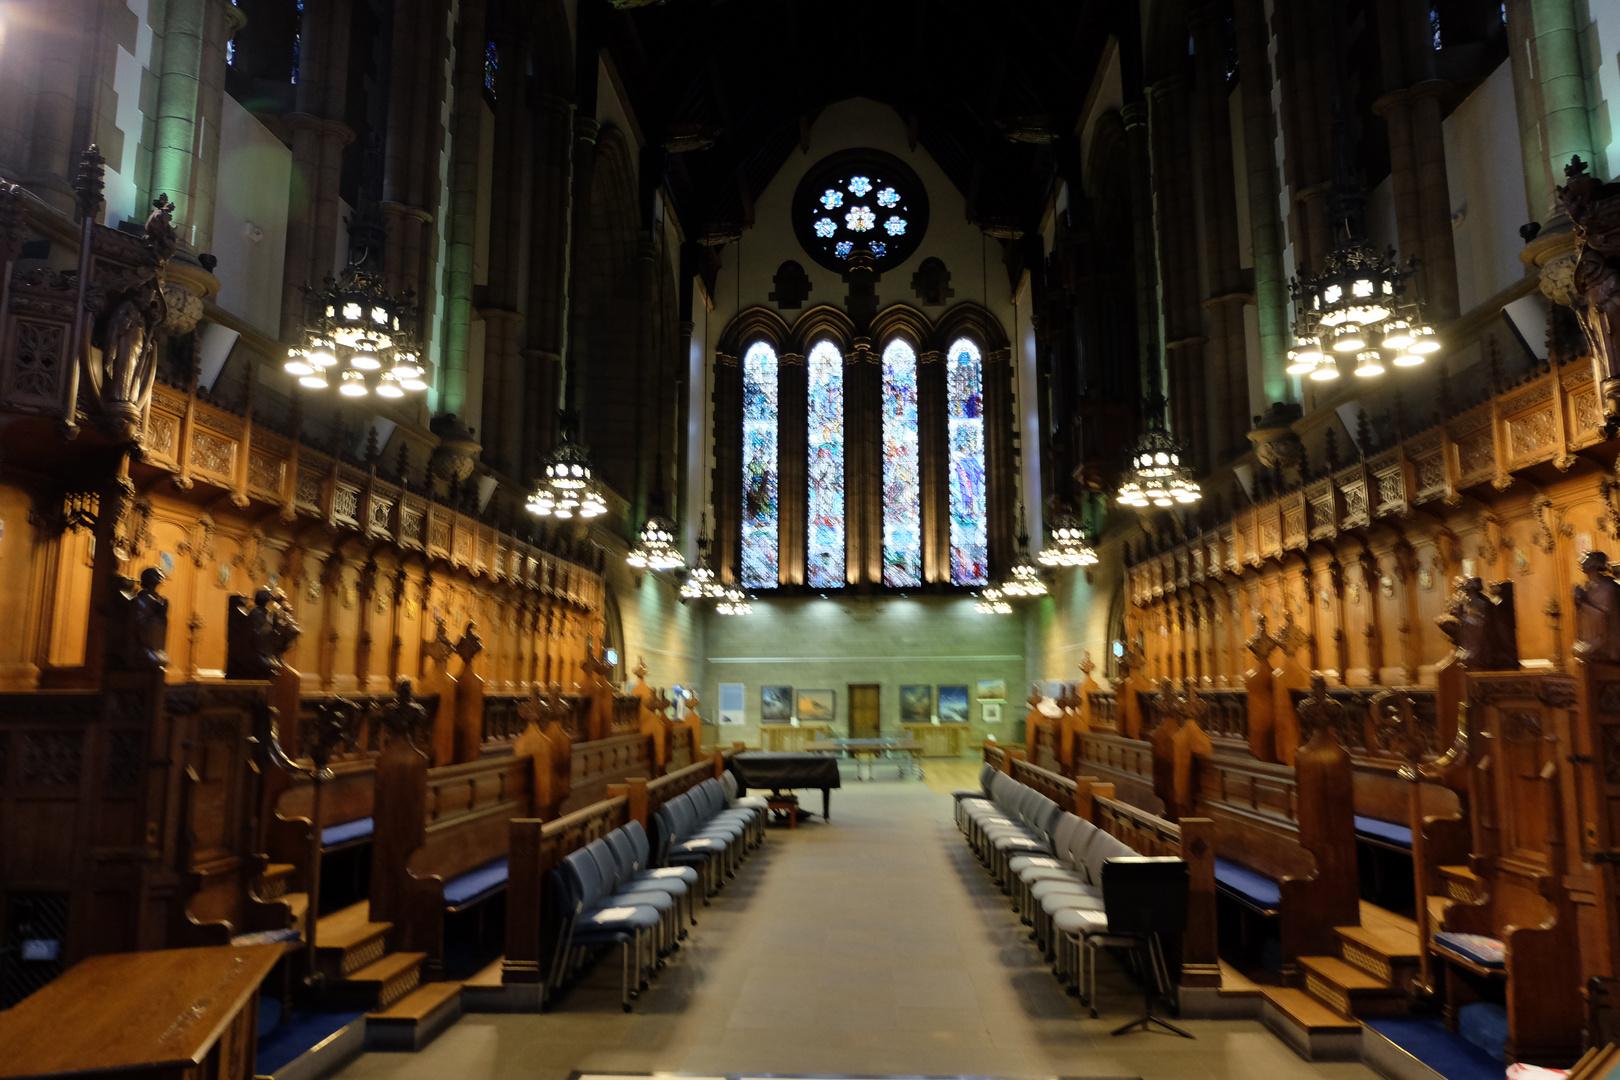 Glasgow, Scotland (3), University of Glasgow Memorial Chapel